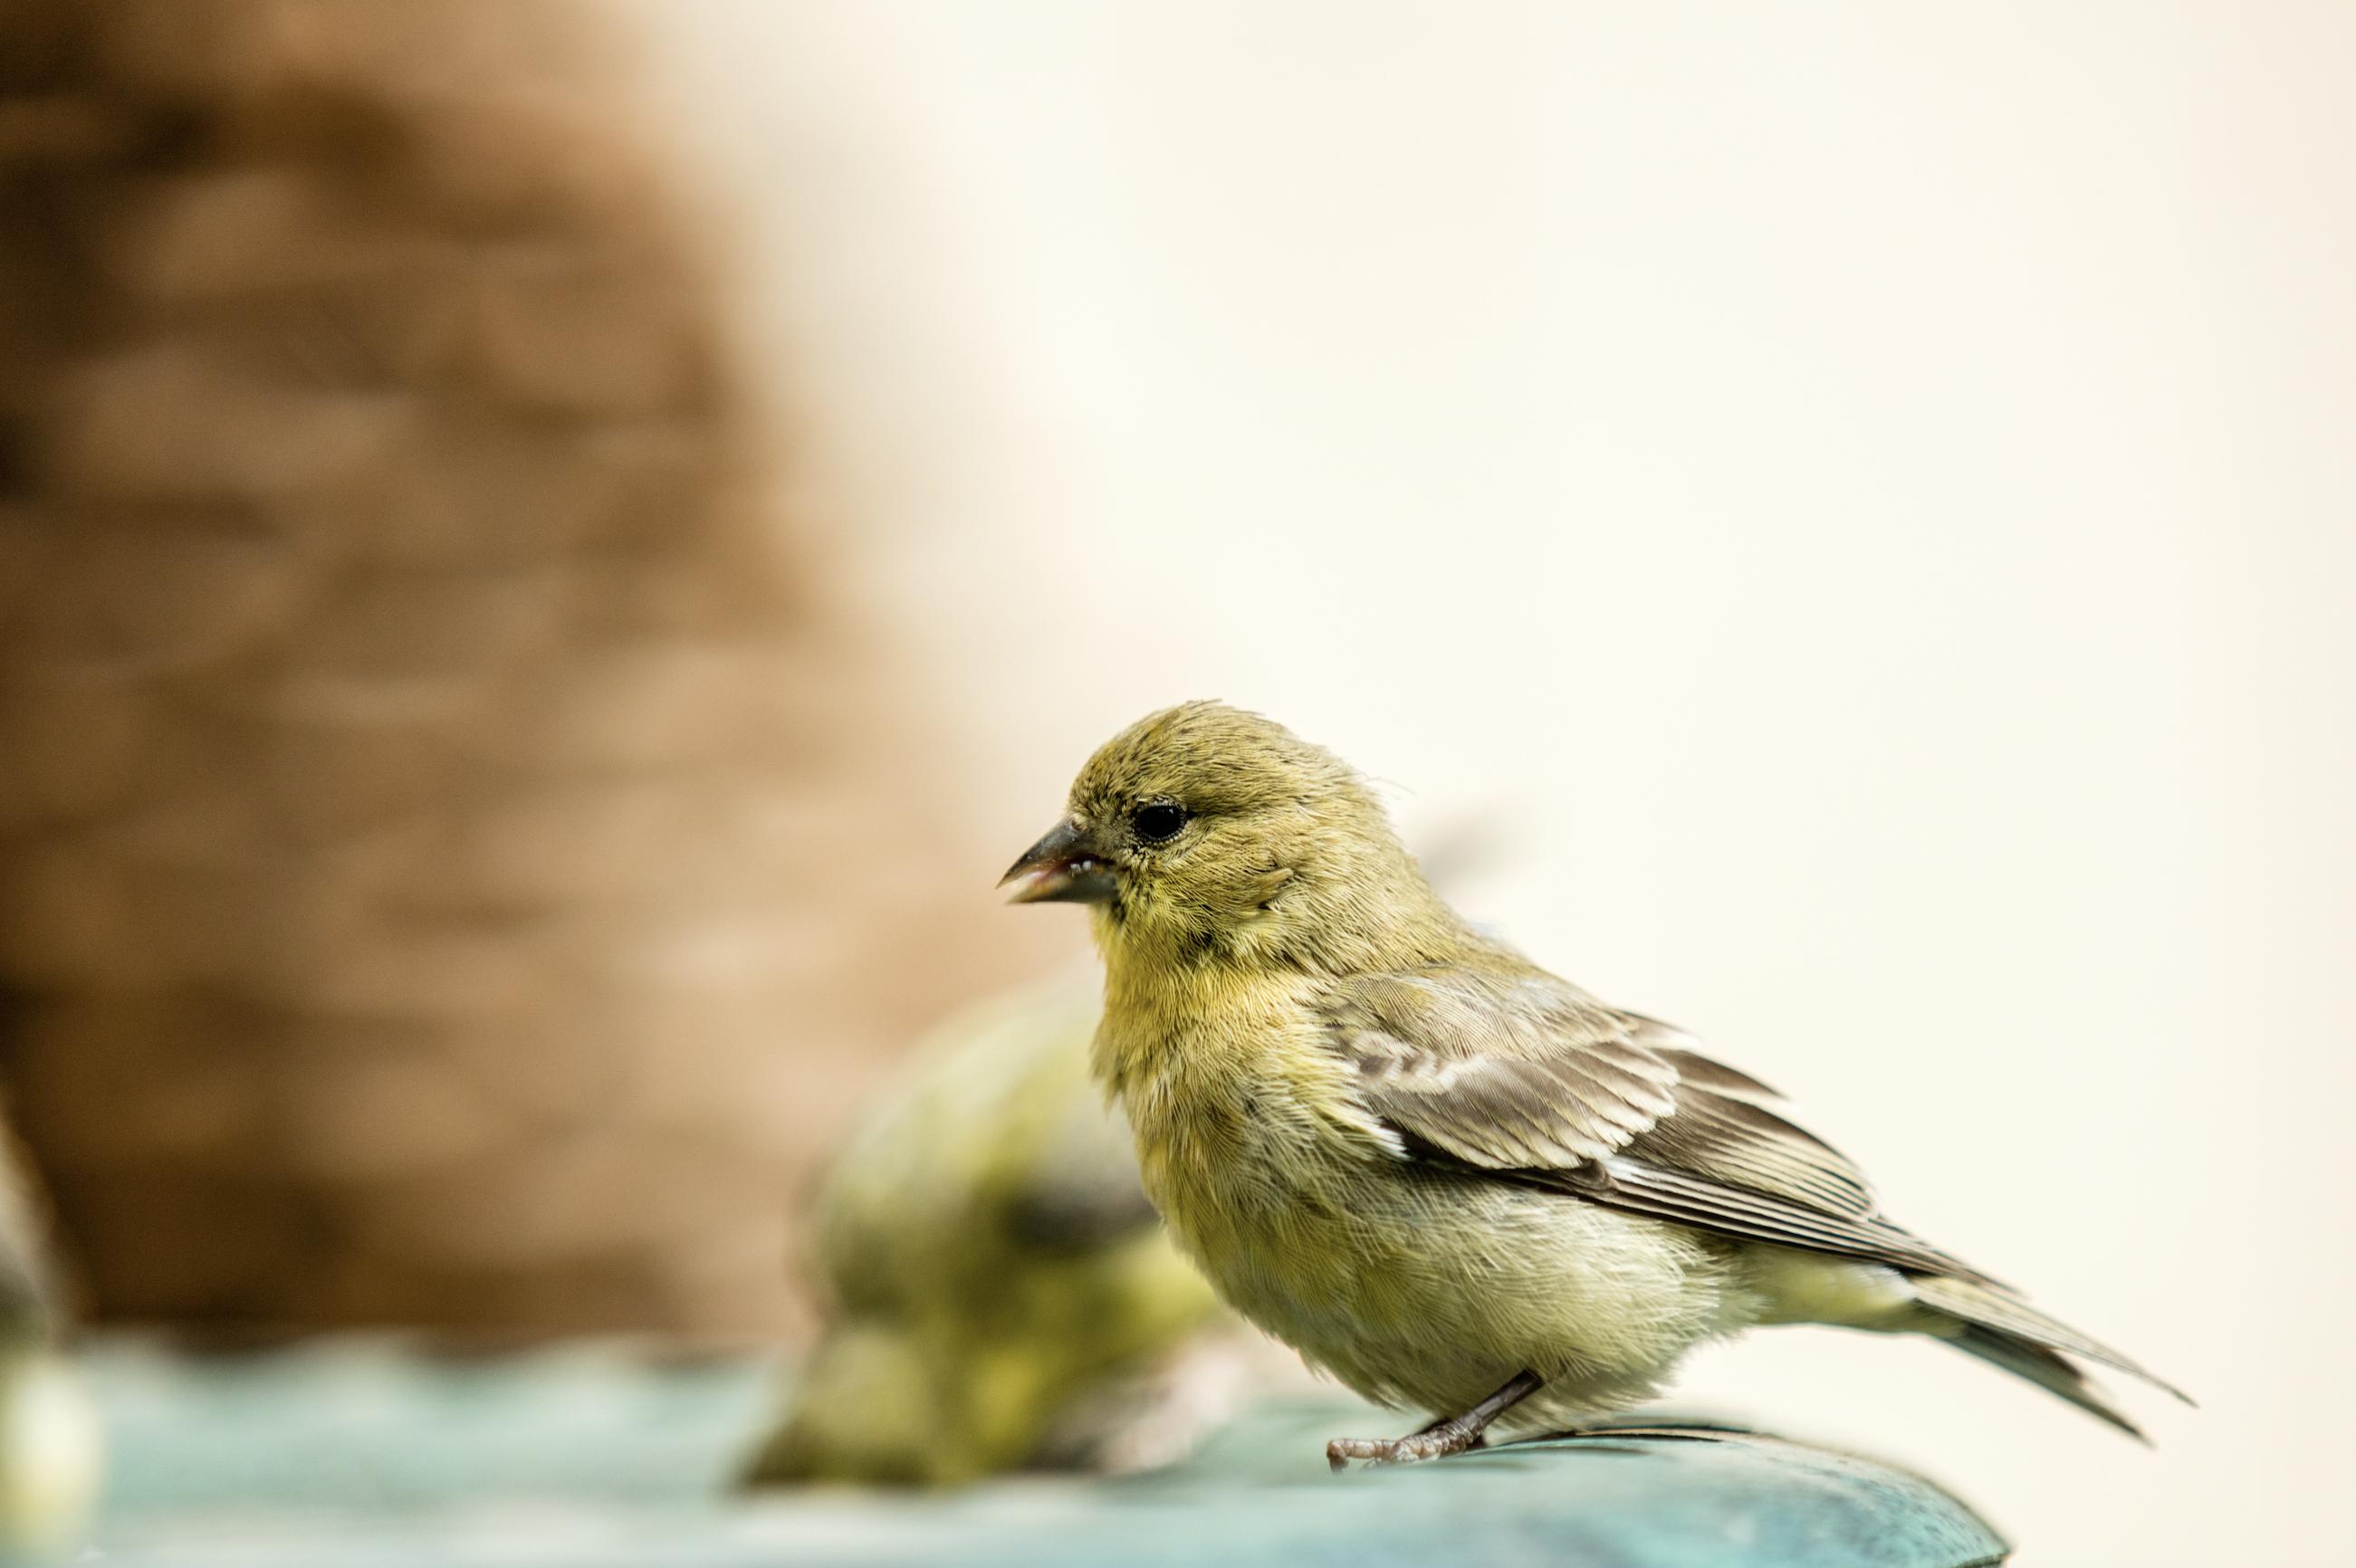 bird taking a bath.jpg